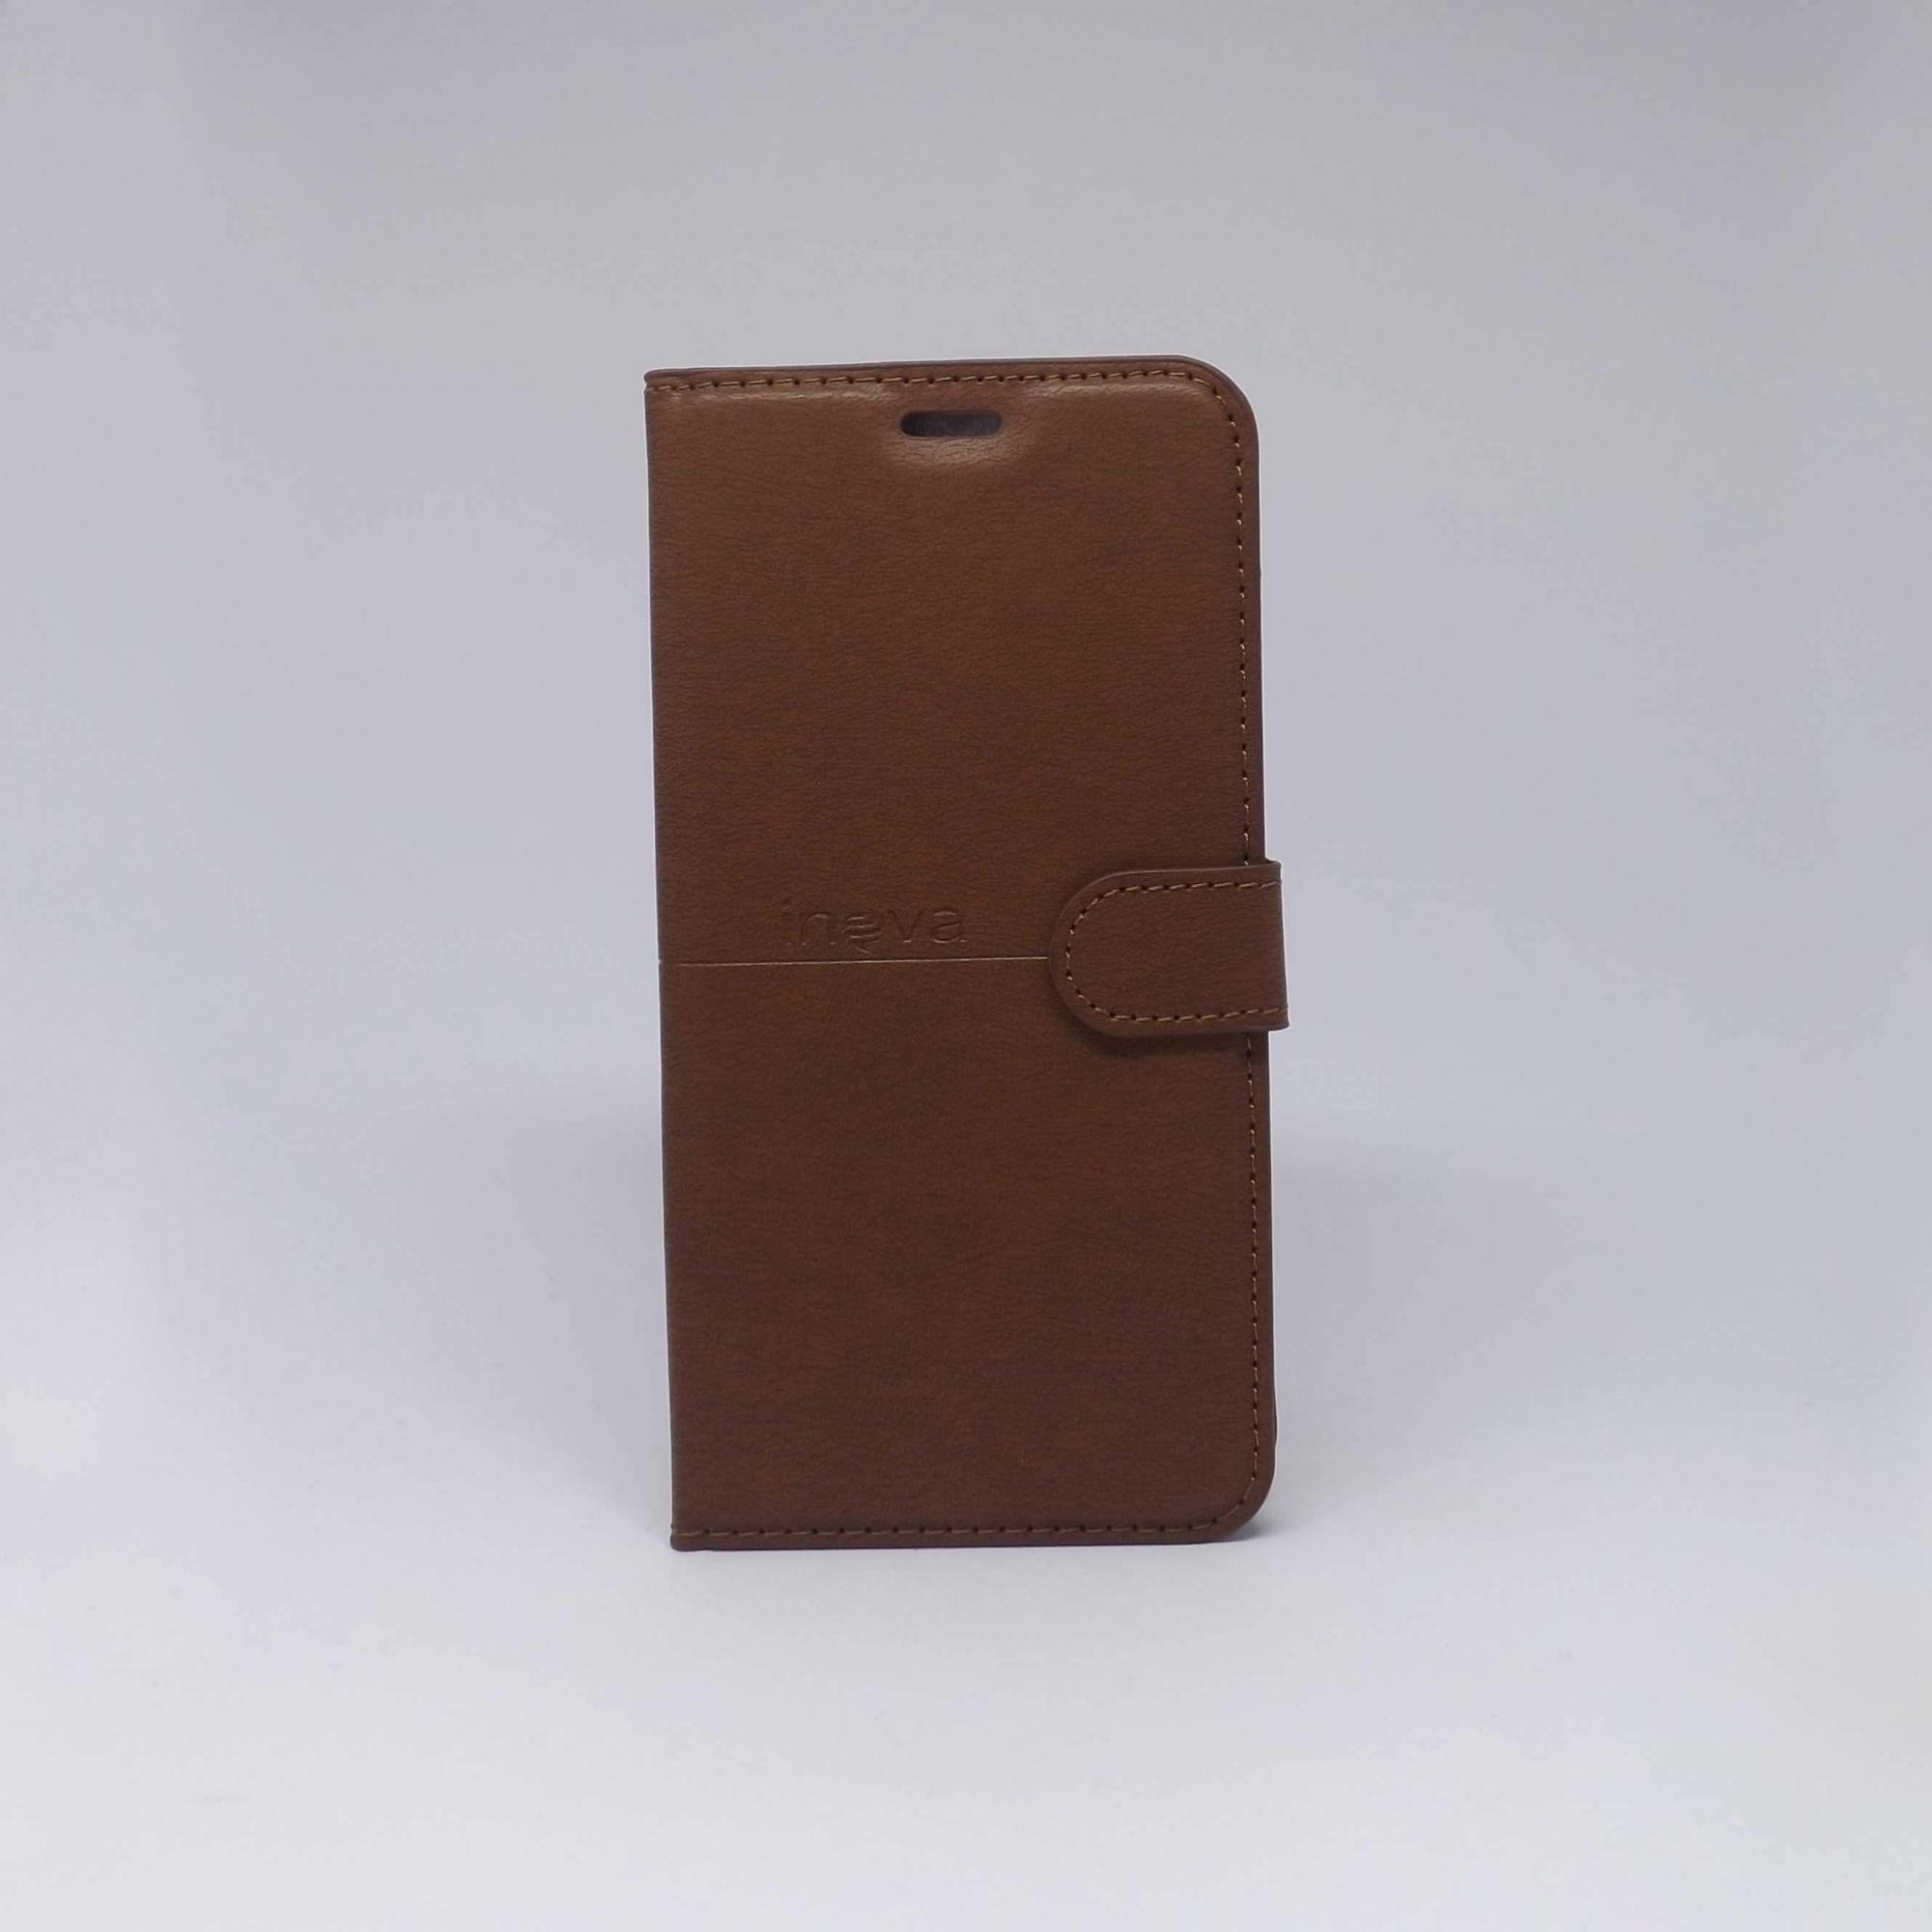 Capa Samsung Galaxy Note 10 Lite Carteira